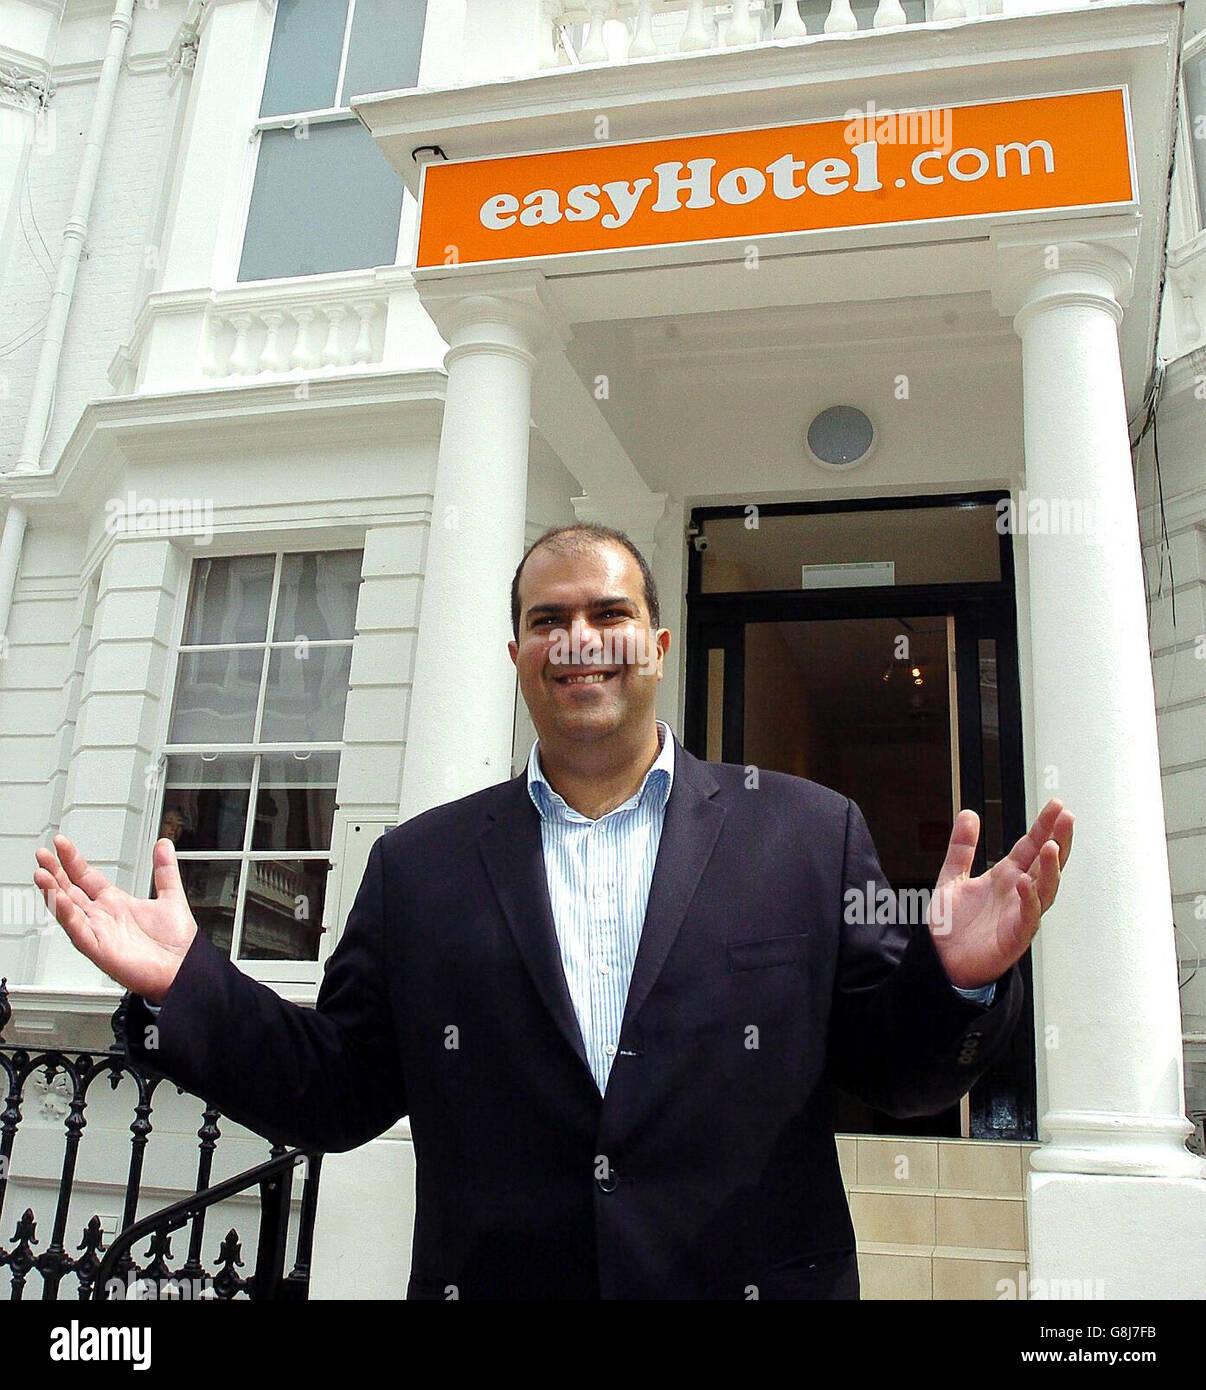 EasyHotel Launch - Lexham Gardens - Earls Court - Stock Image